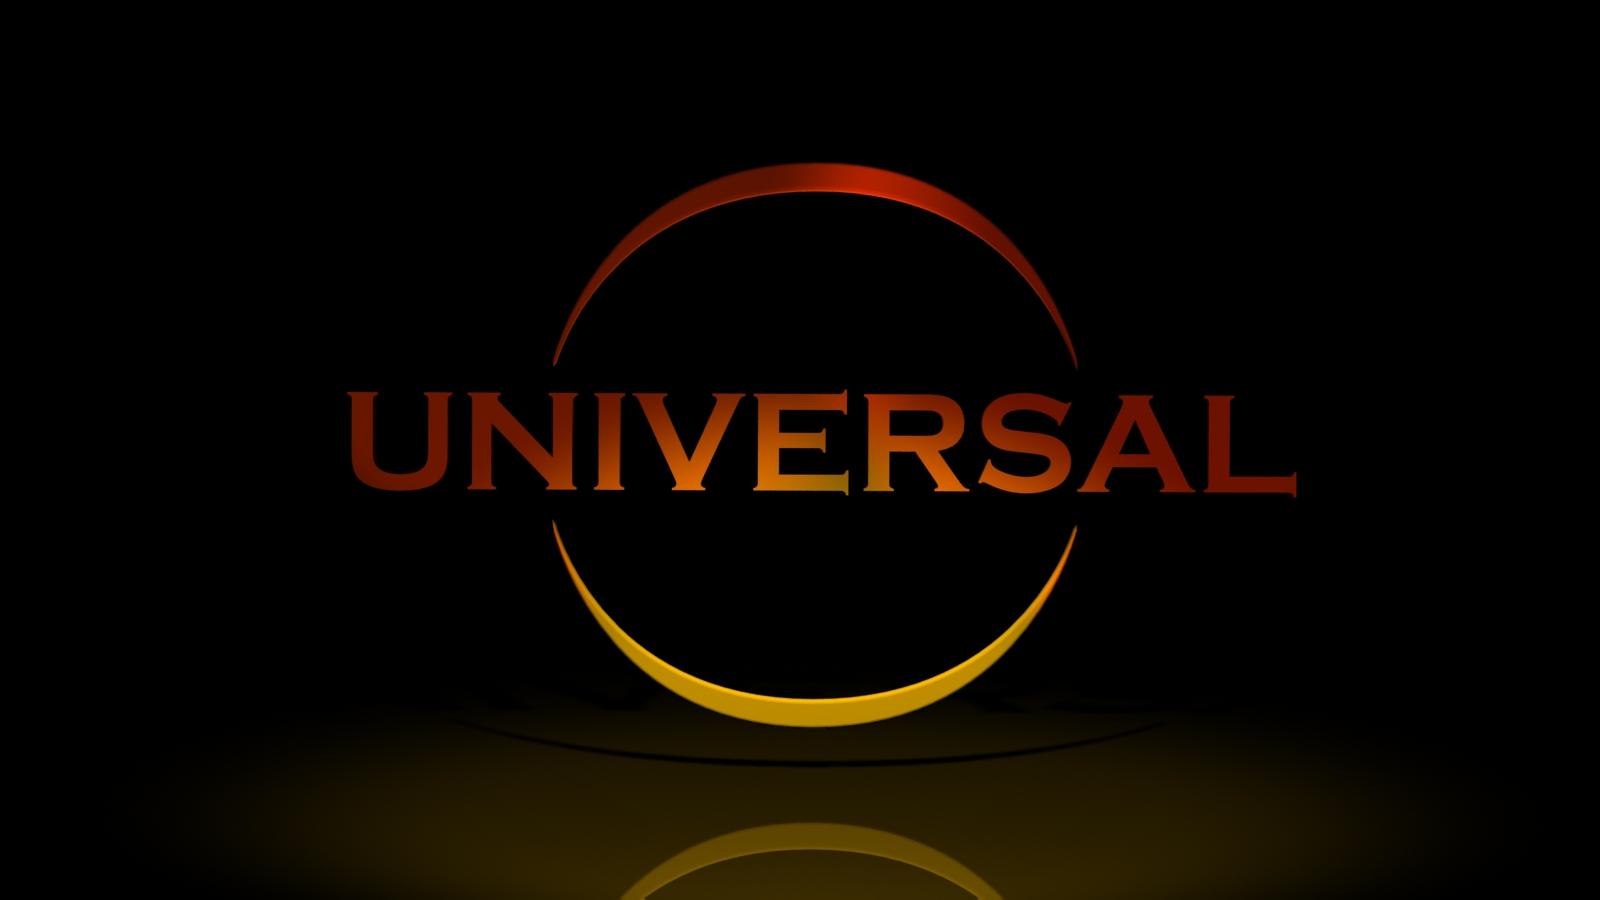 Universal Studios Logo Wallpaper 1600x900